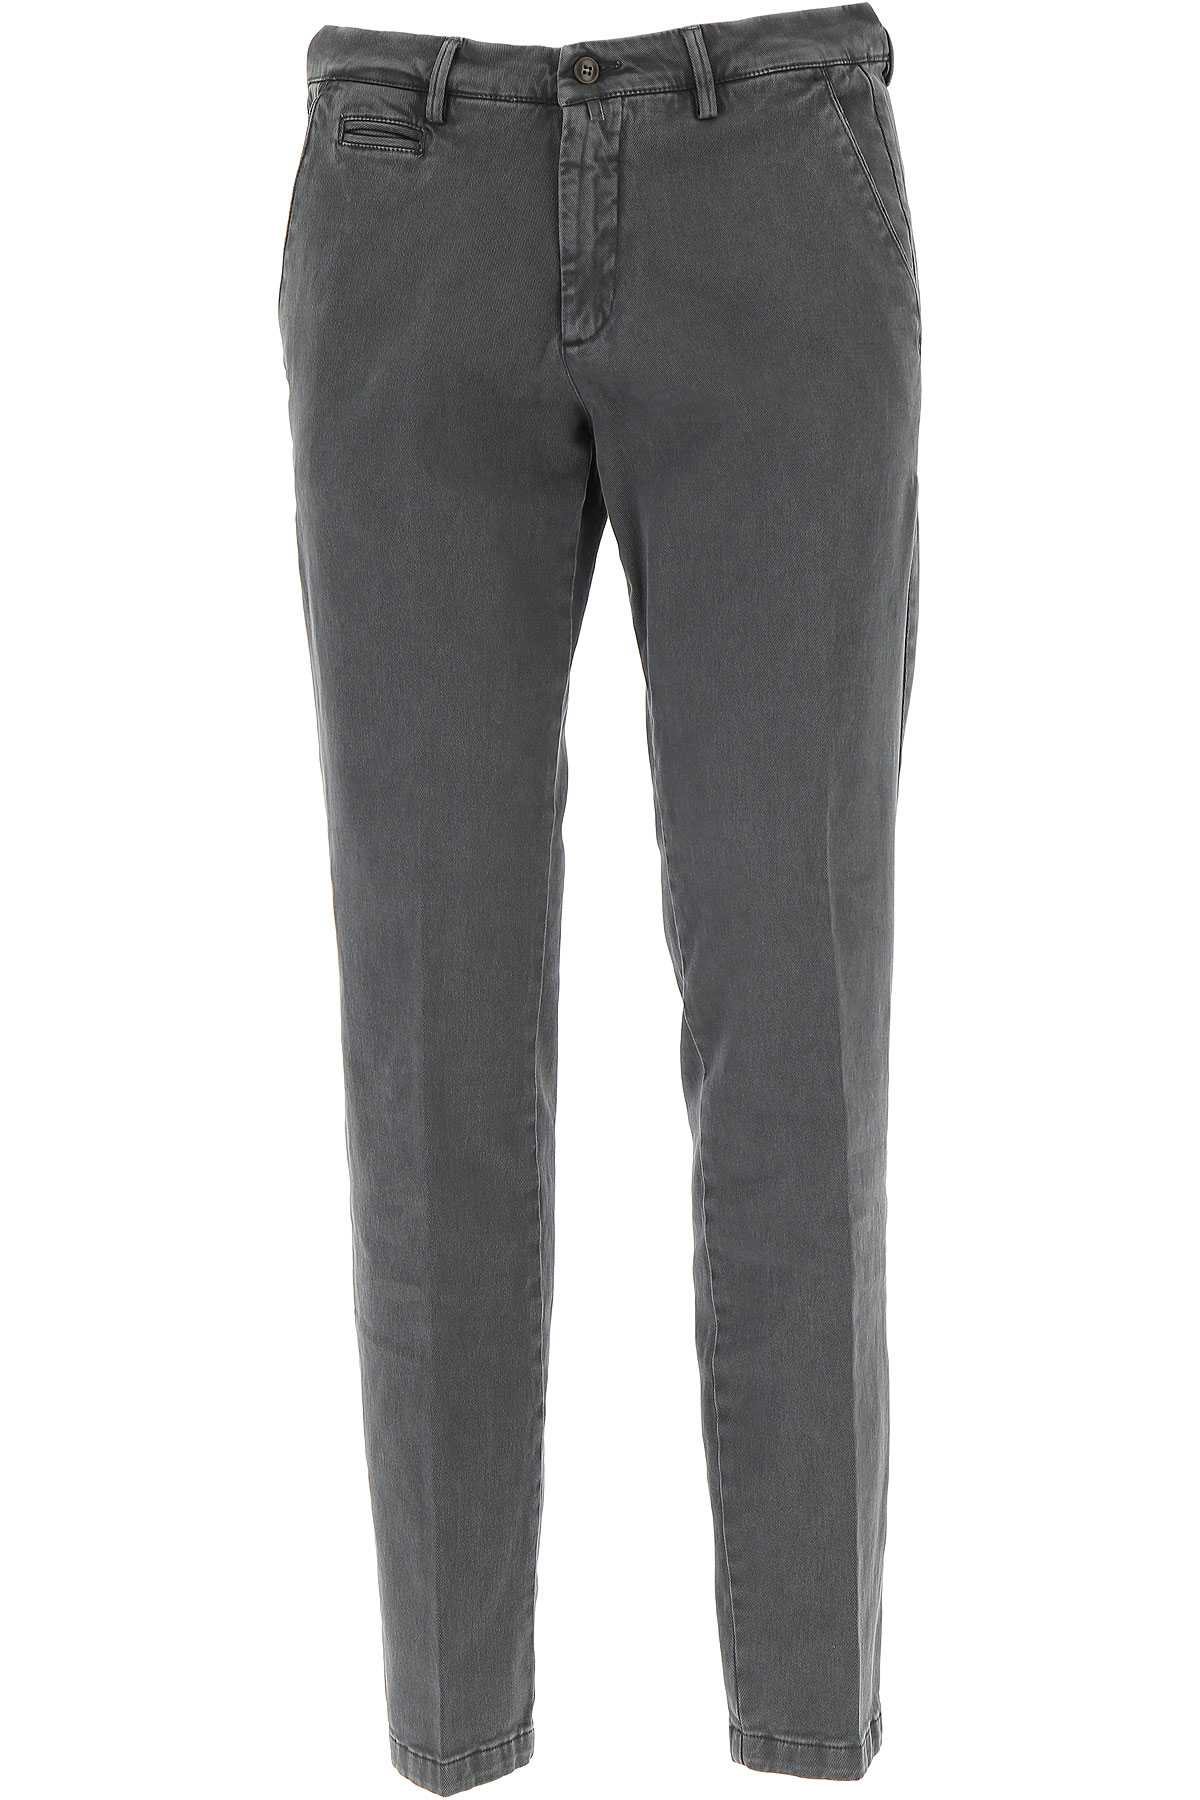 Image of Briglia Pants for Men, Washed Grey, Cotton, 2017, US 34 - EU 48 US 36 - EU 50